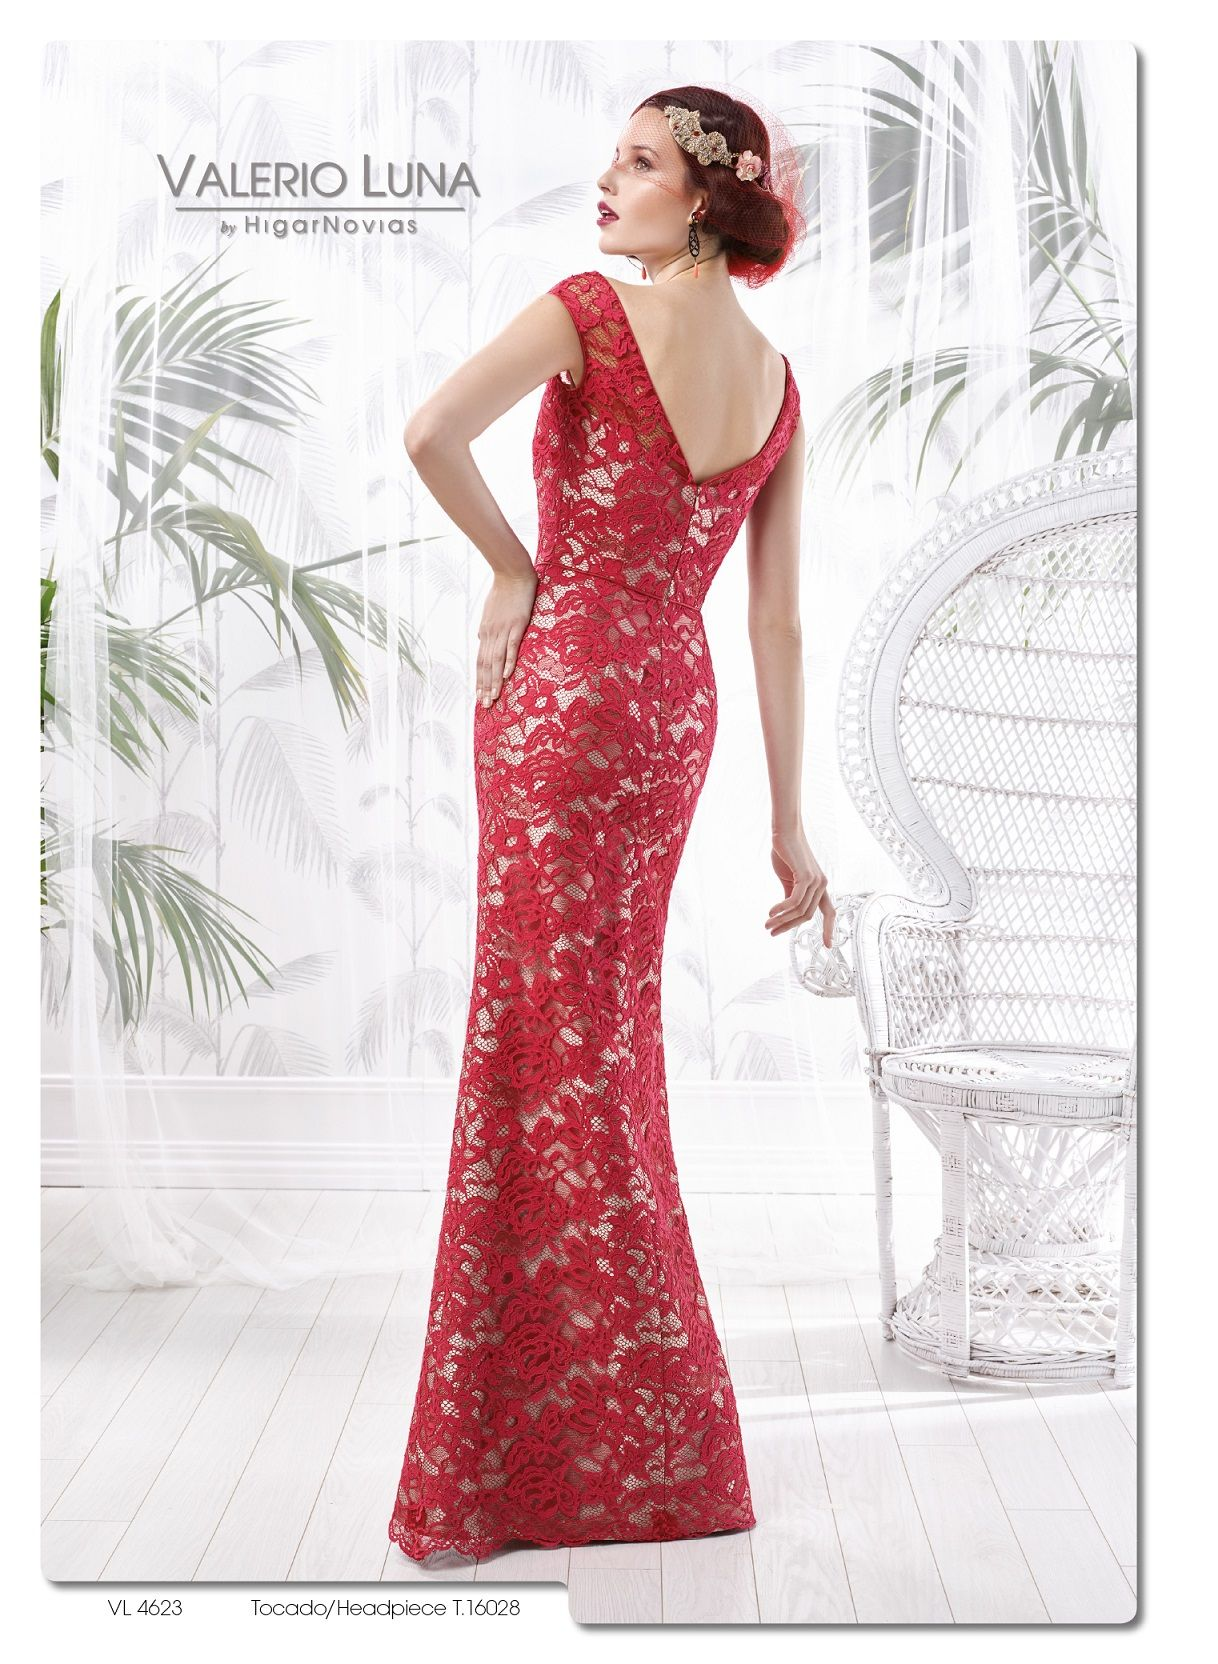 vestido fiesta valerio luna | Dress 3 | Pinterest